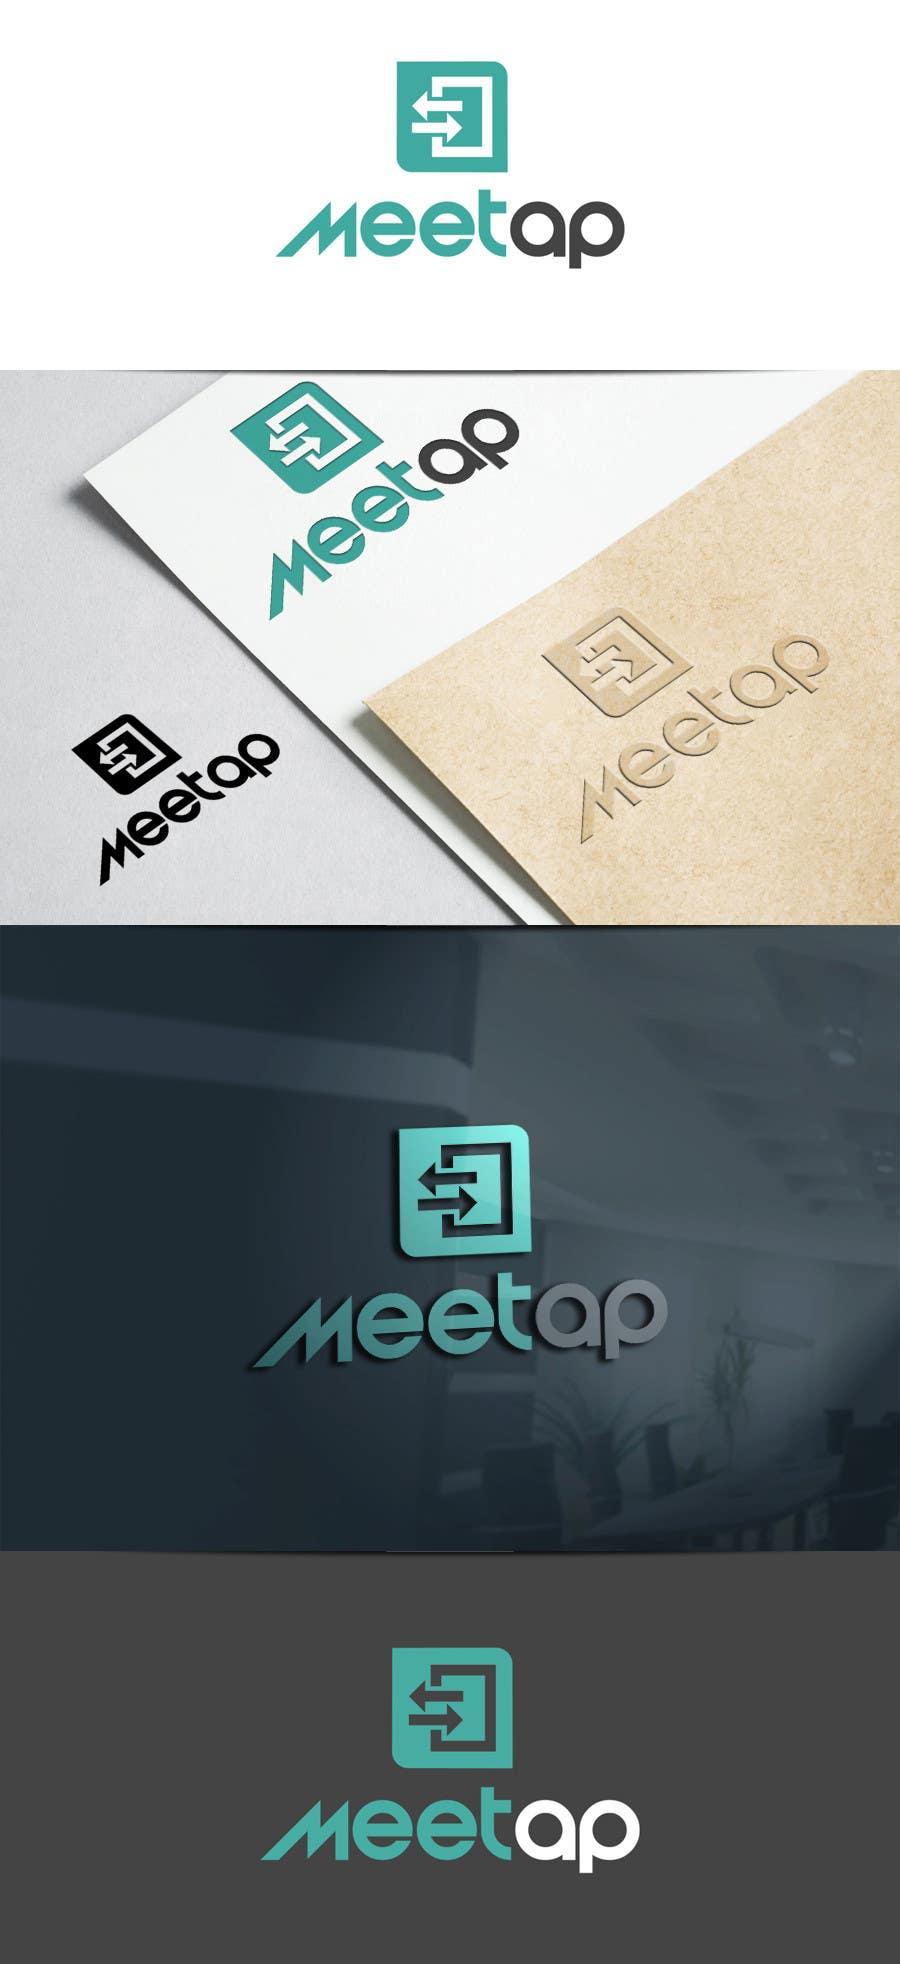 Konkurrenceindlæg #73 for Logo design for a web and mobile application